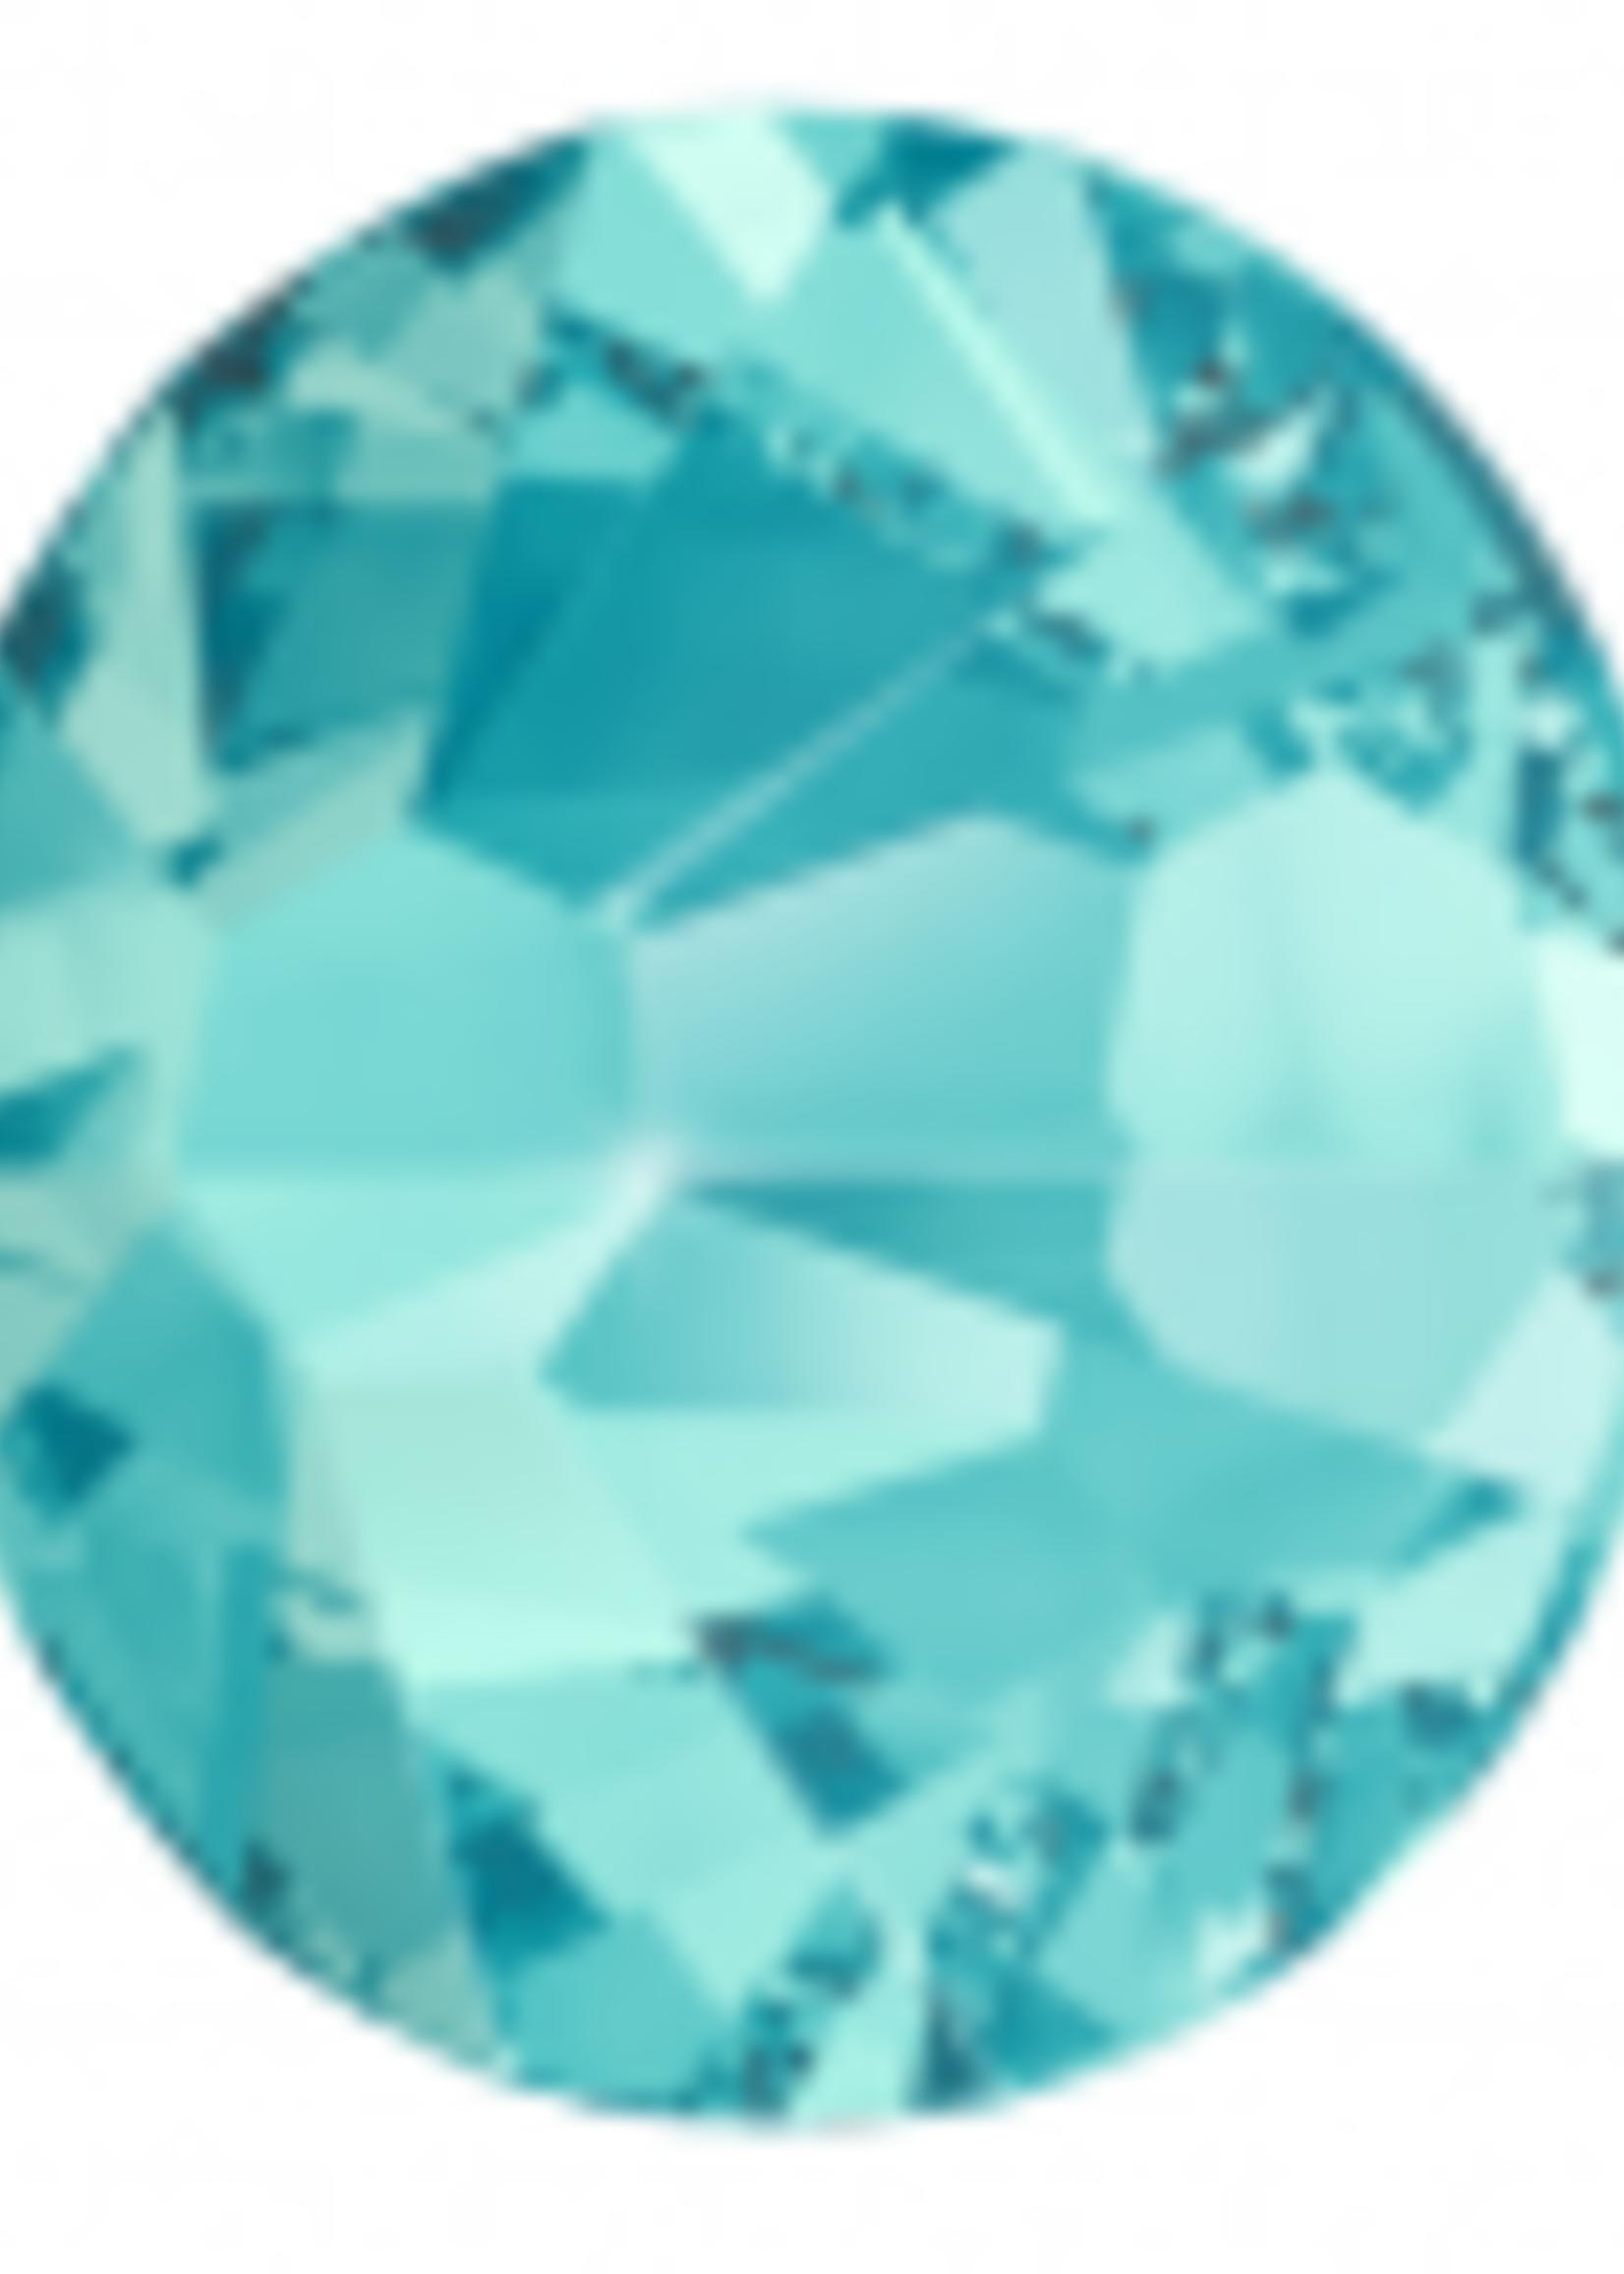 Swarovski Swarovski Crystal Light Turquoise 1.75 mm